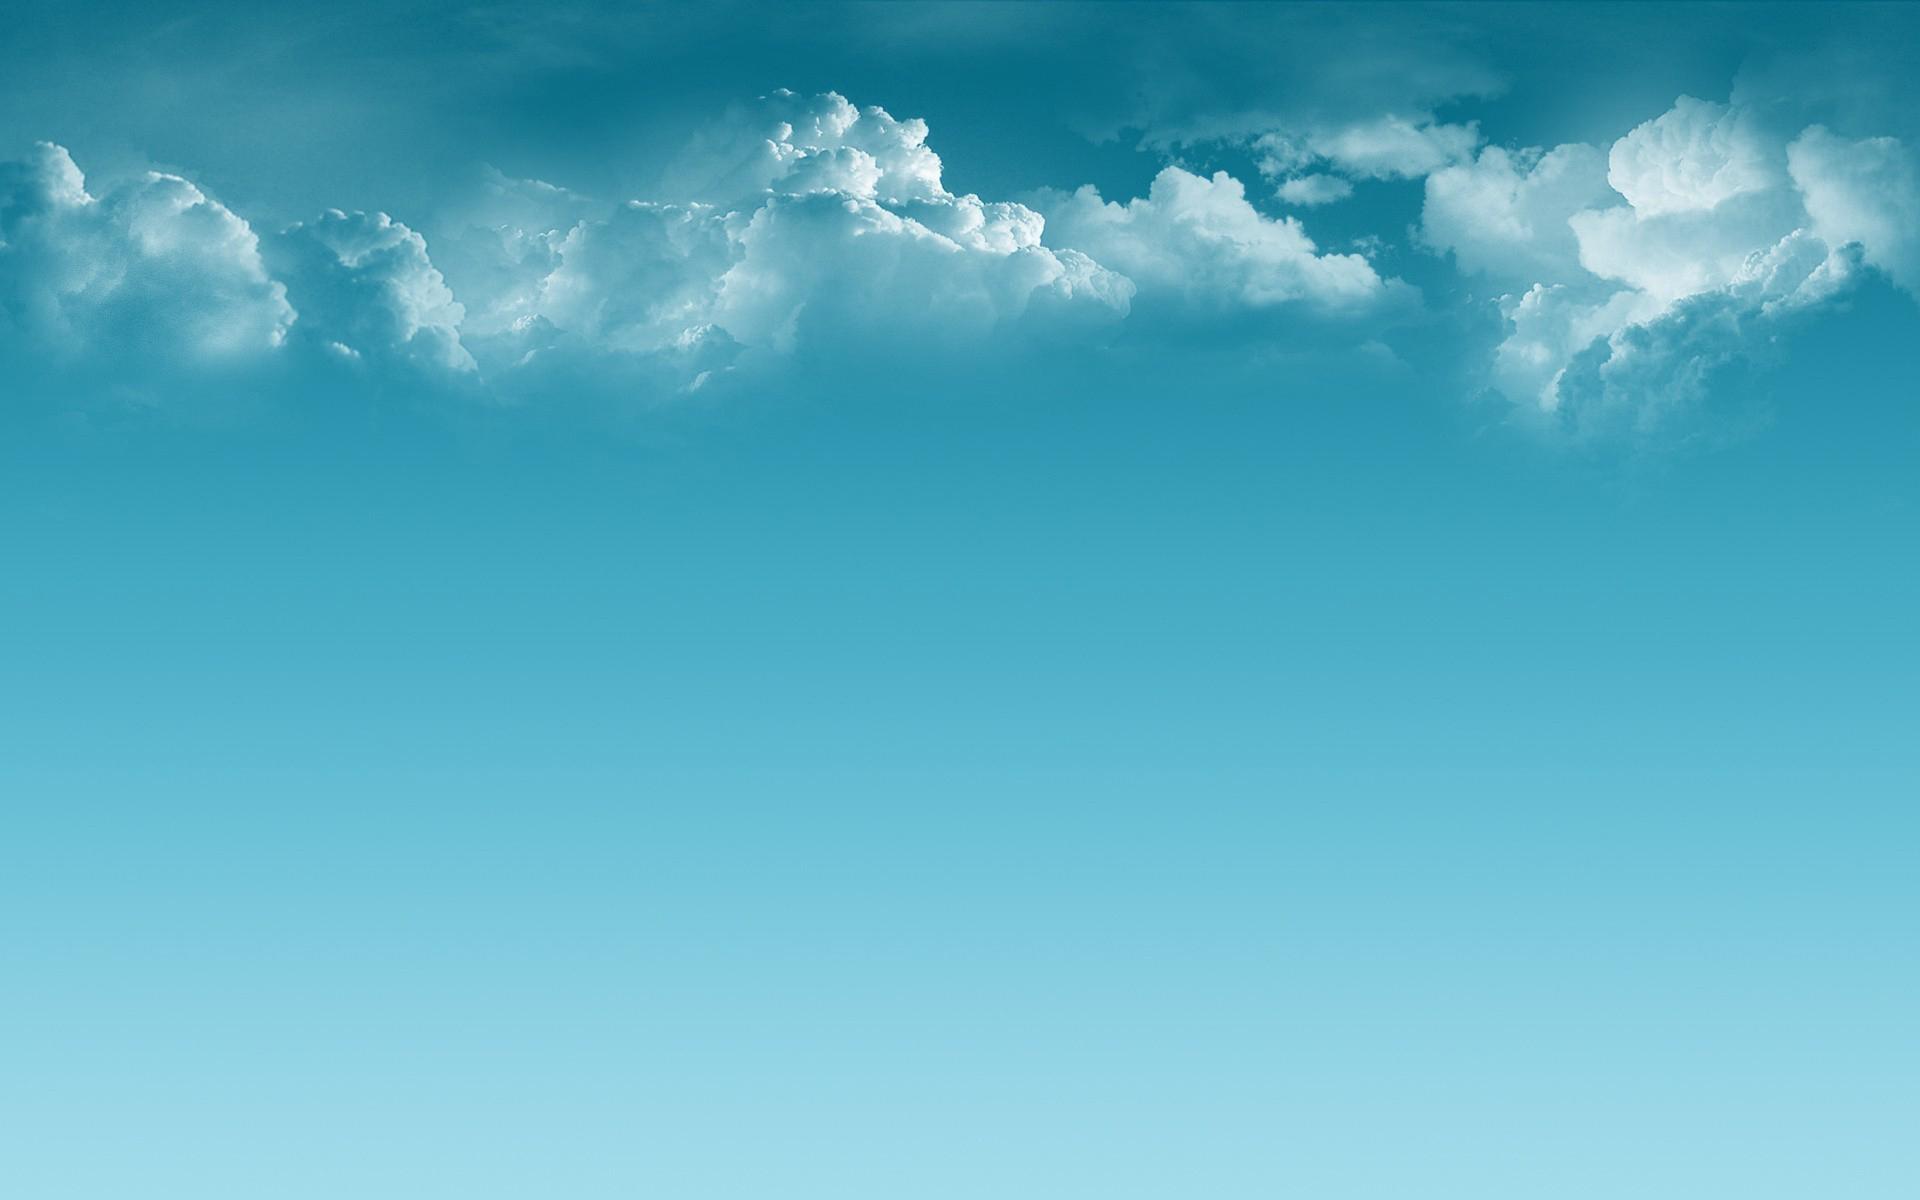 Desktop Sky Backgrounds 1920x1200